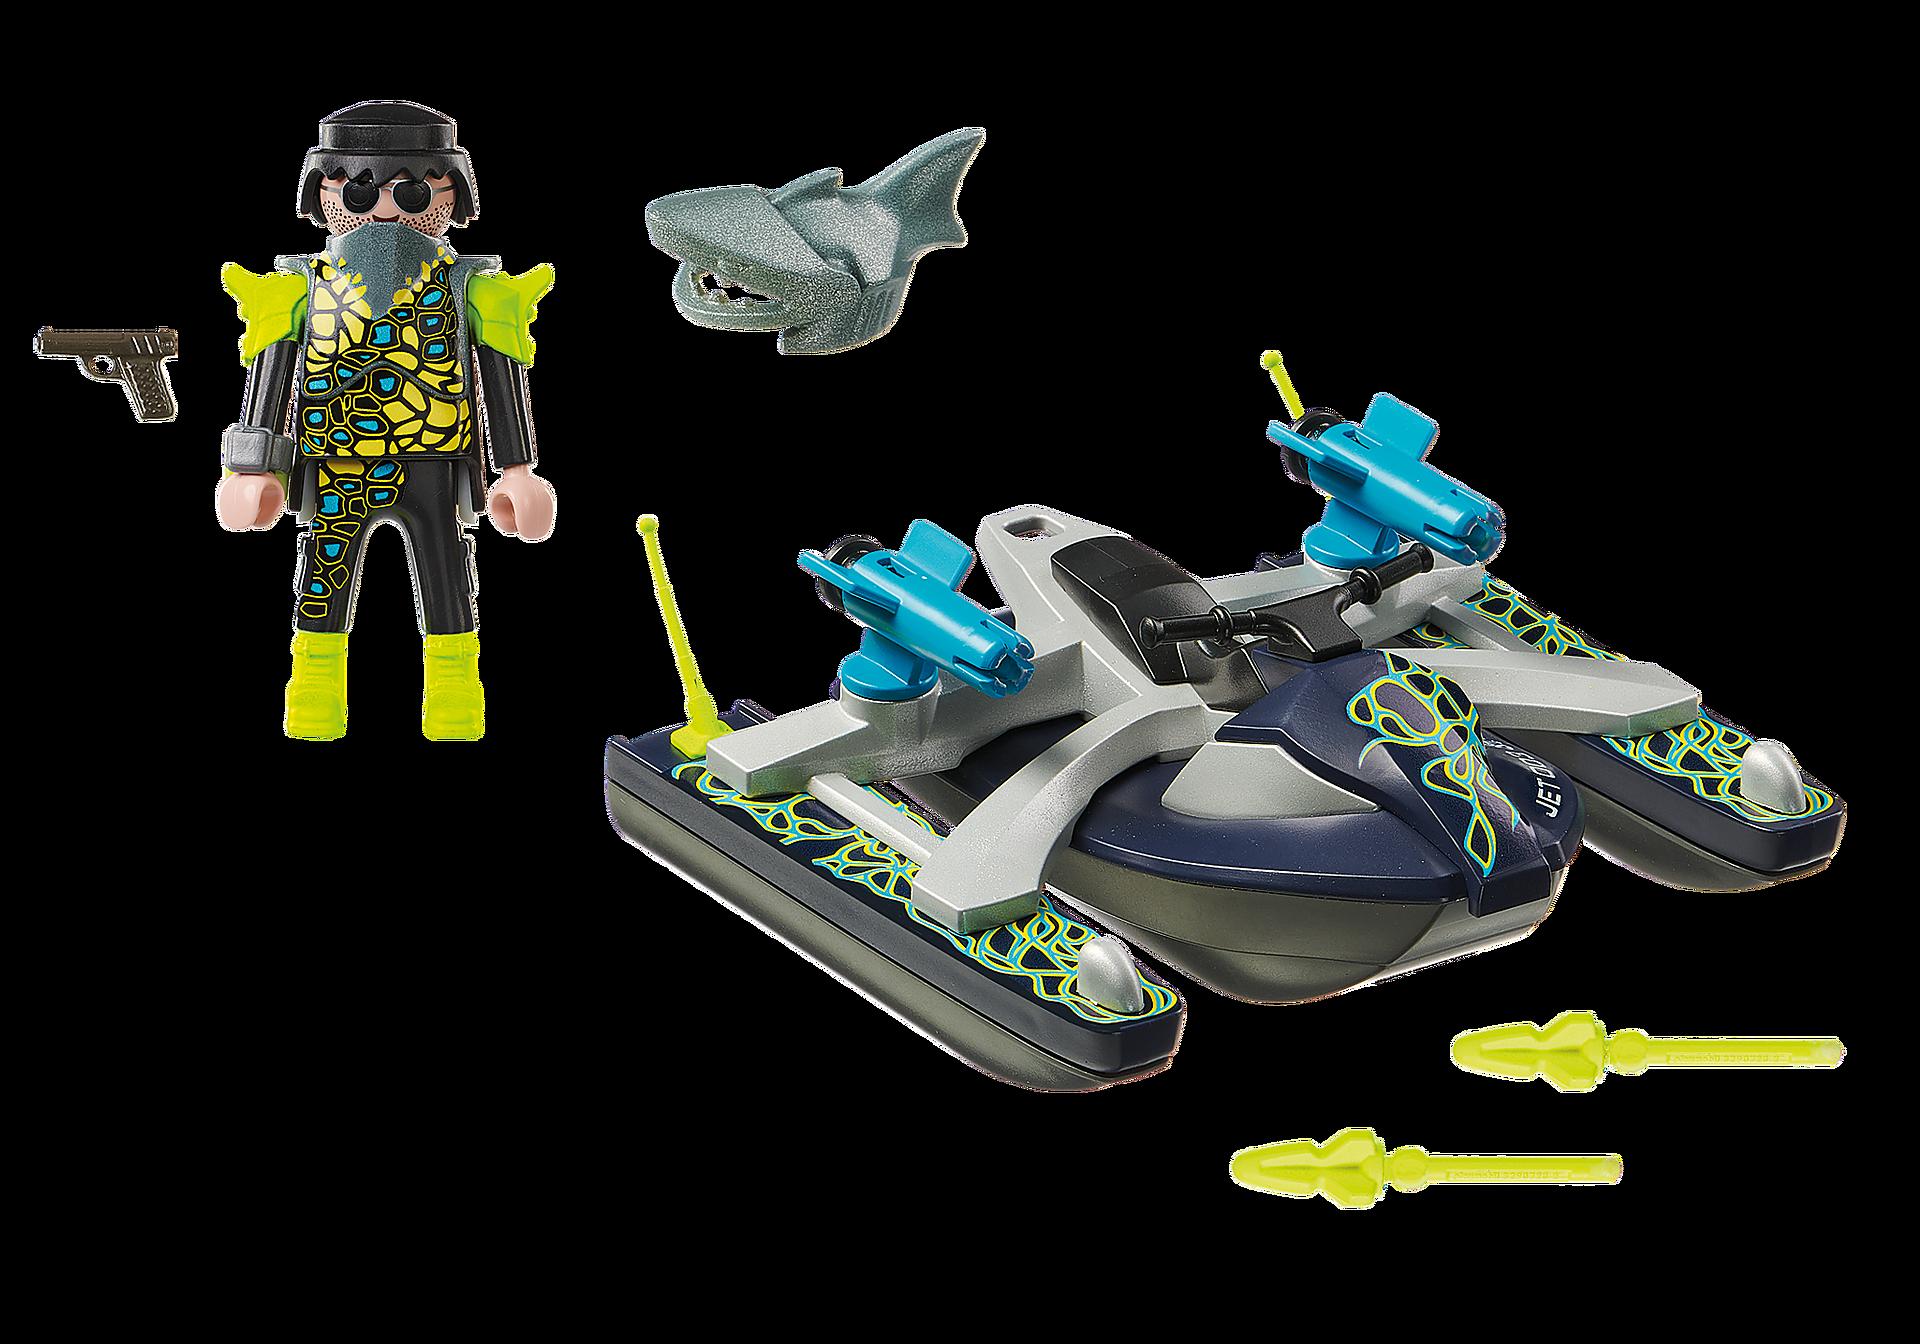 http://media.playmobil.com/i/playmobil/70007_product_box_back/TEAM S.H.A.R.K. Rocket Rafter